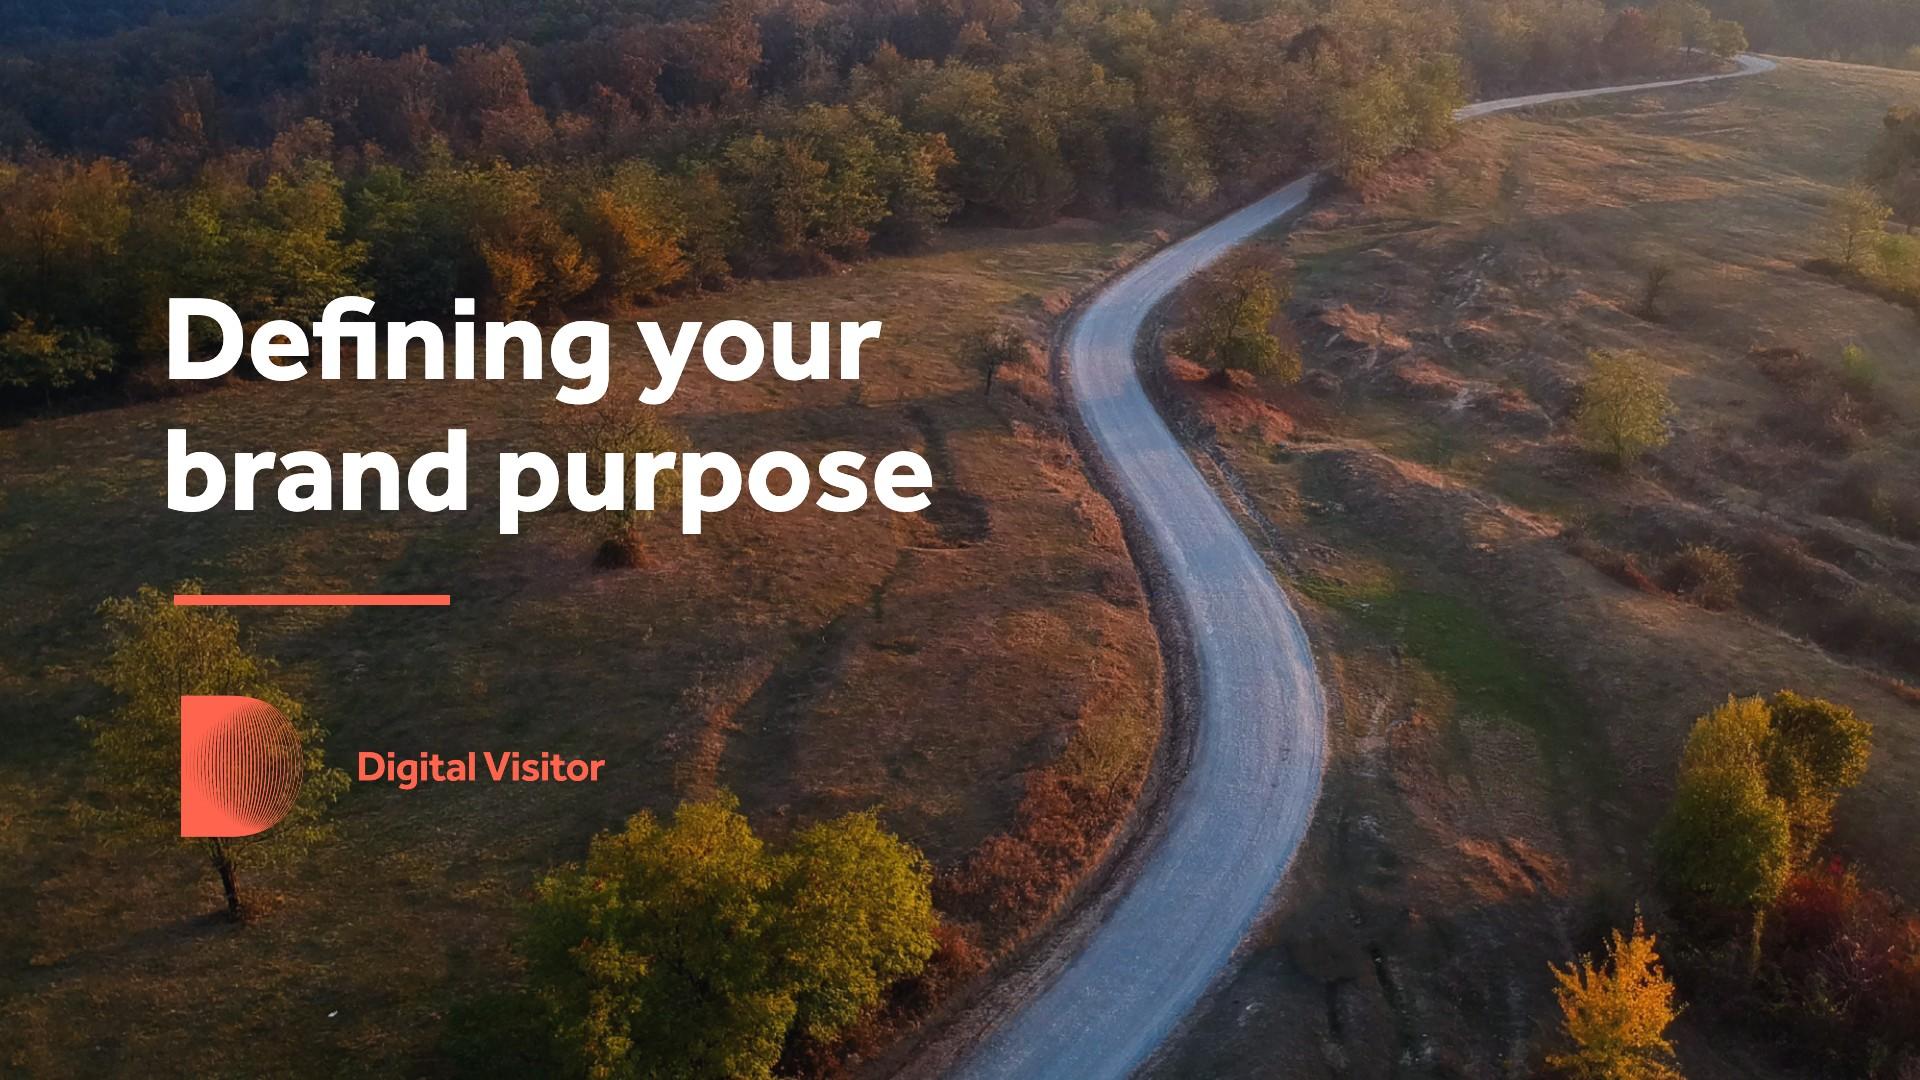 Defining your brand purpose